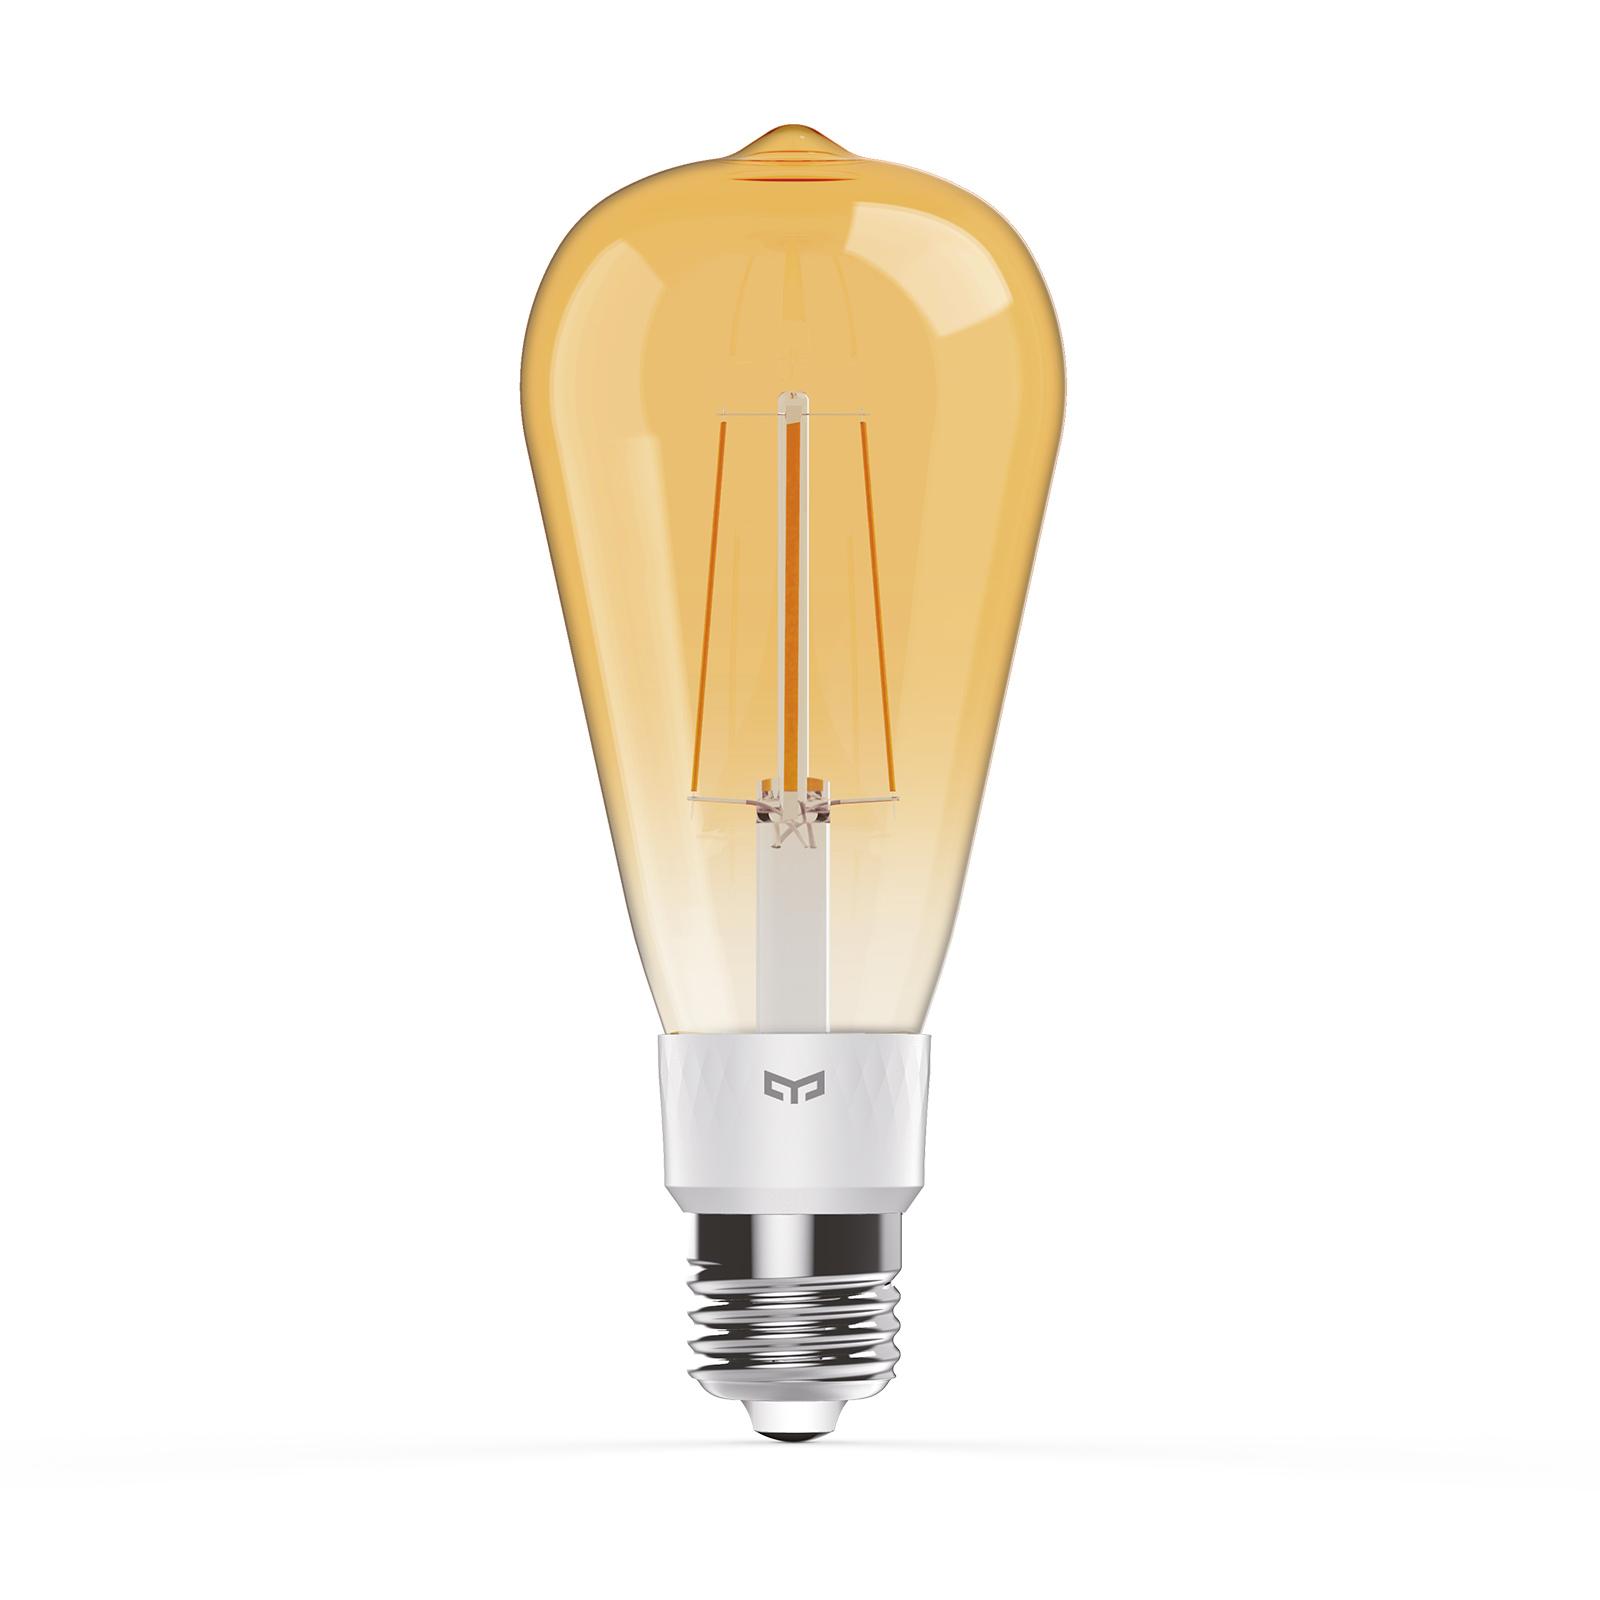 Yeelight Smart LED-Lampe E27 6W Filament 2000K dim